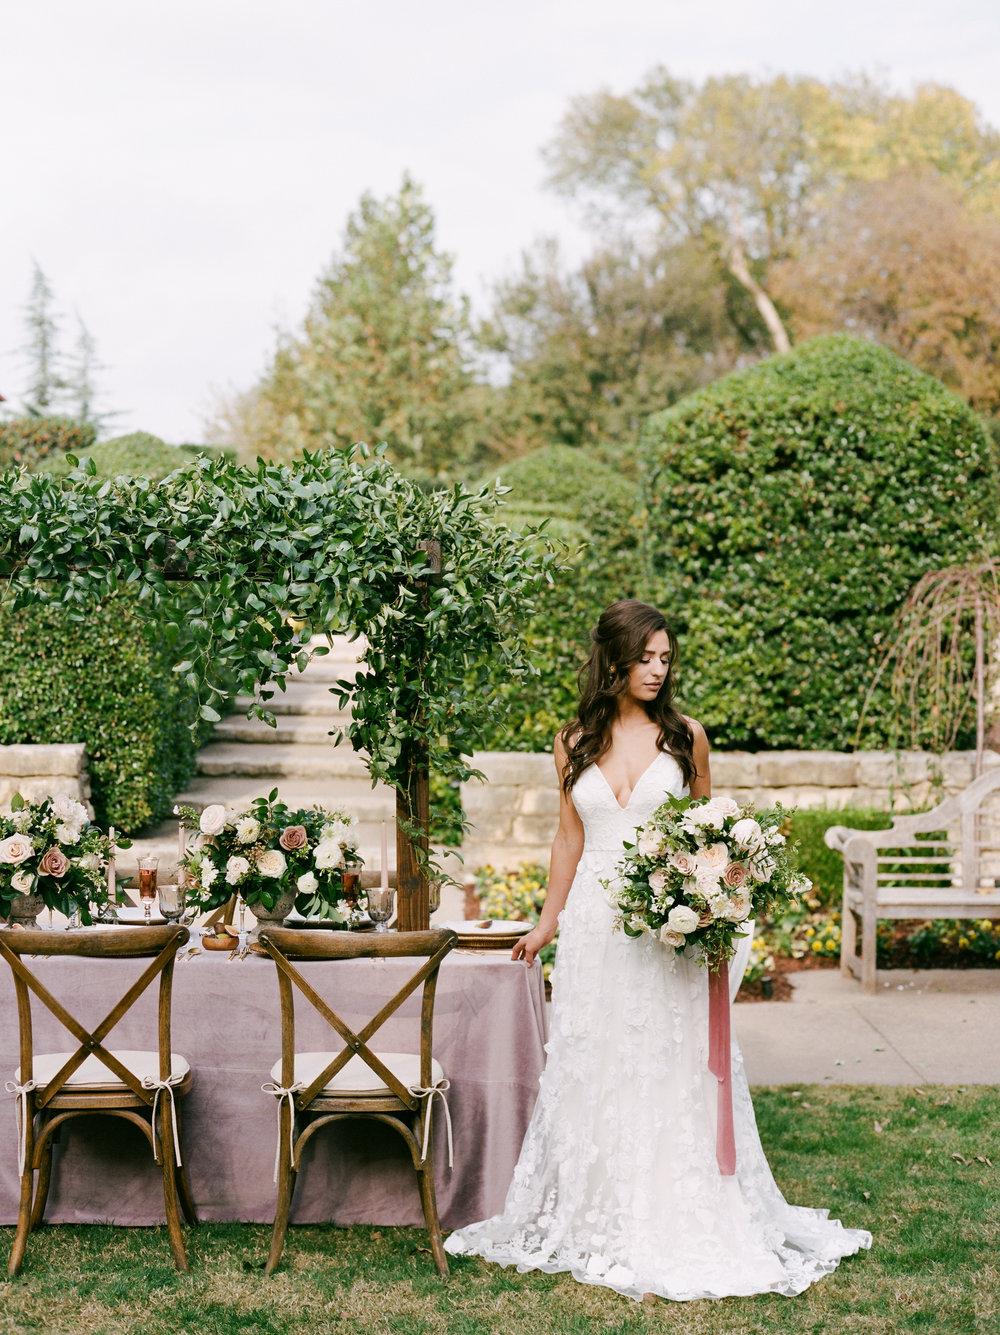 dallas-arboretum-botanical-garden-ar-photography-brides-of-north-texas-2018-70.jpg